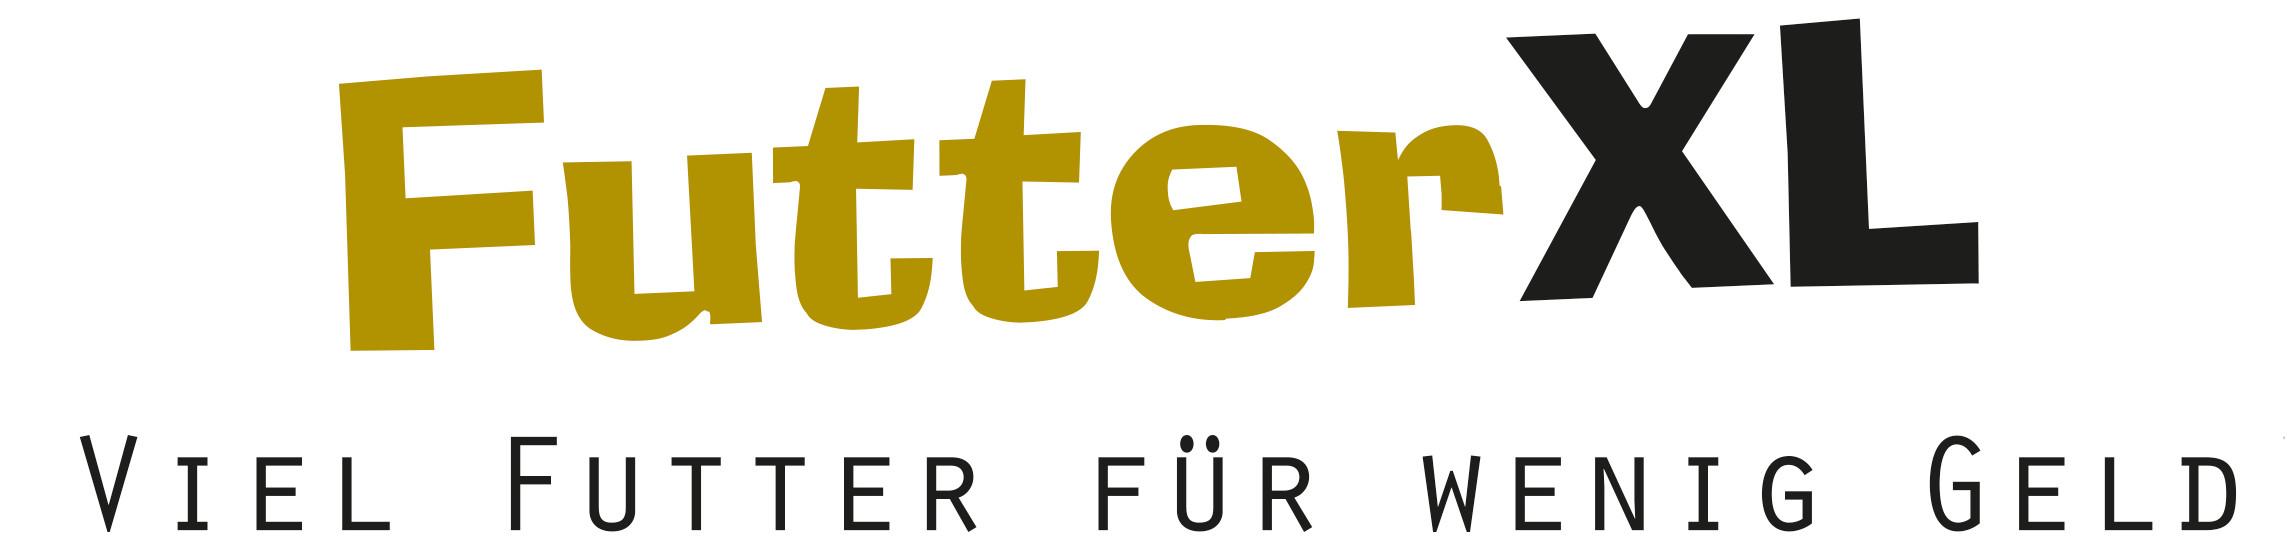 Futtermittel Kuhnwald GmbH